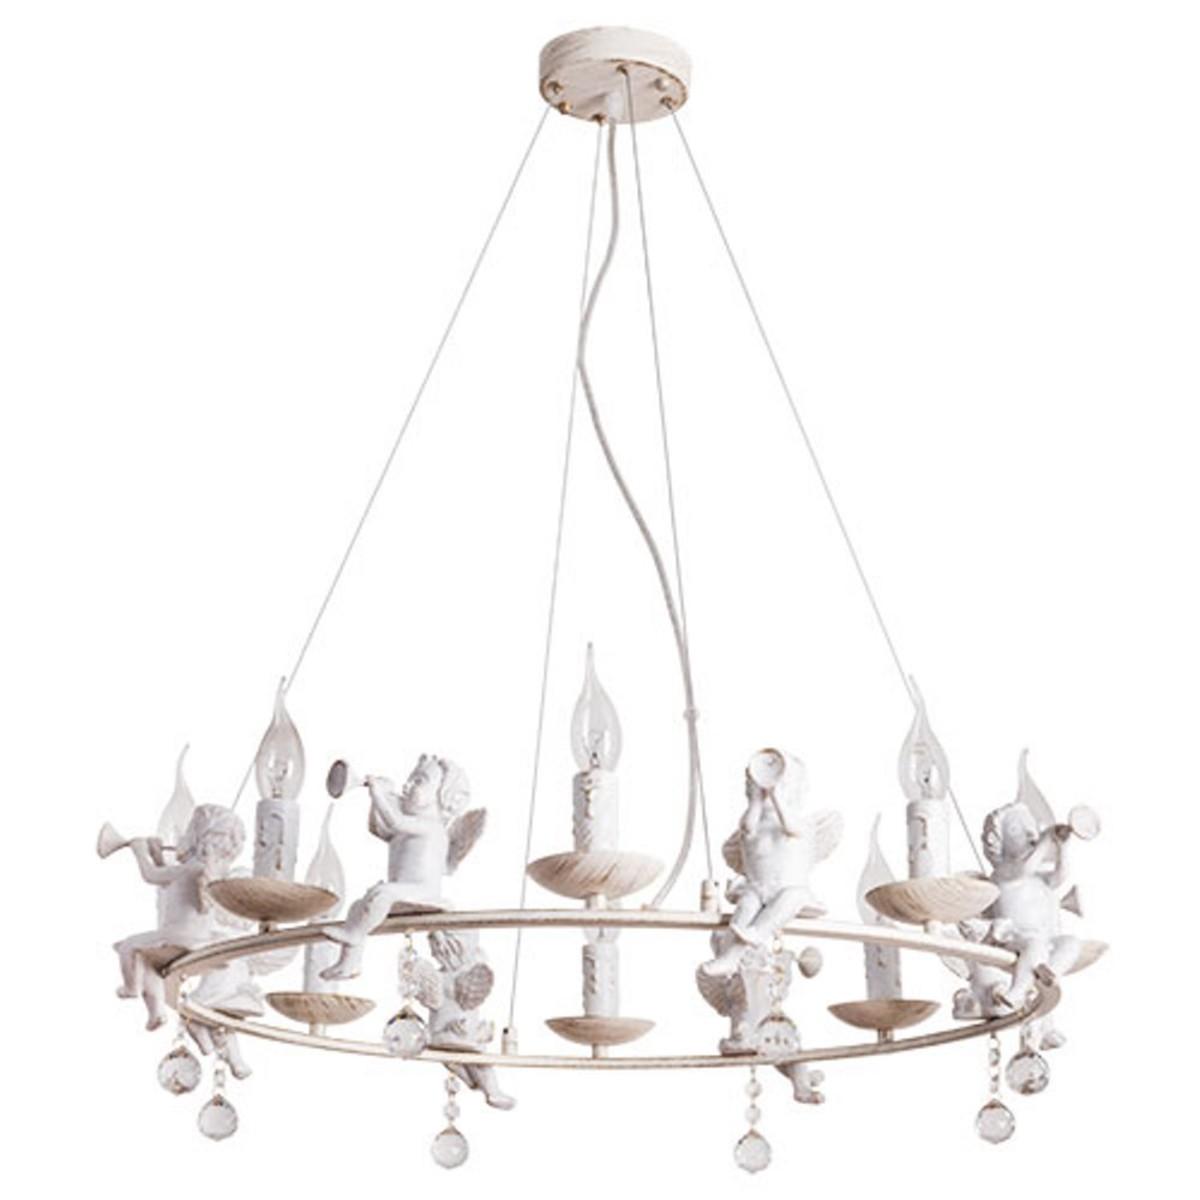 Люстра Arte Lamp Amur A1133SP-8WG E14 8 ламп